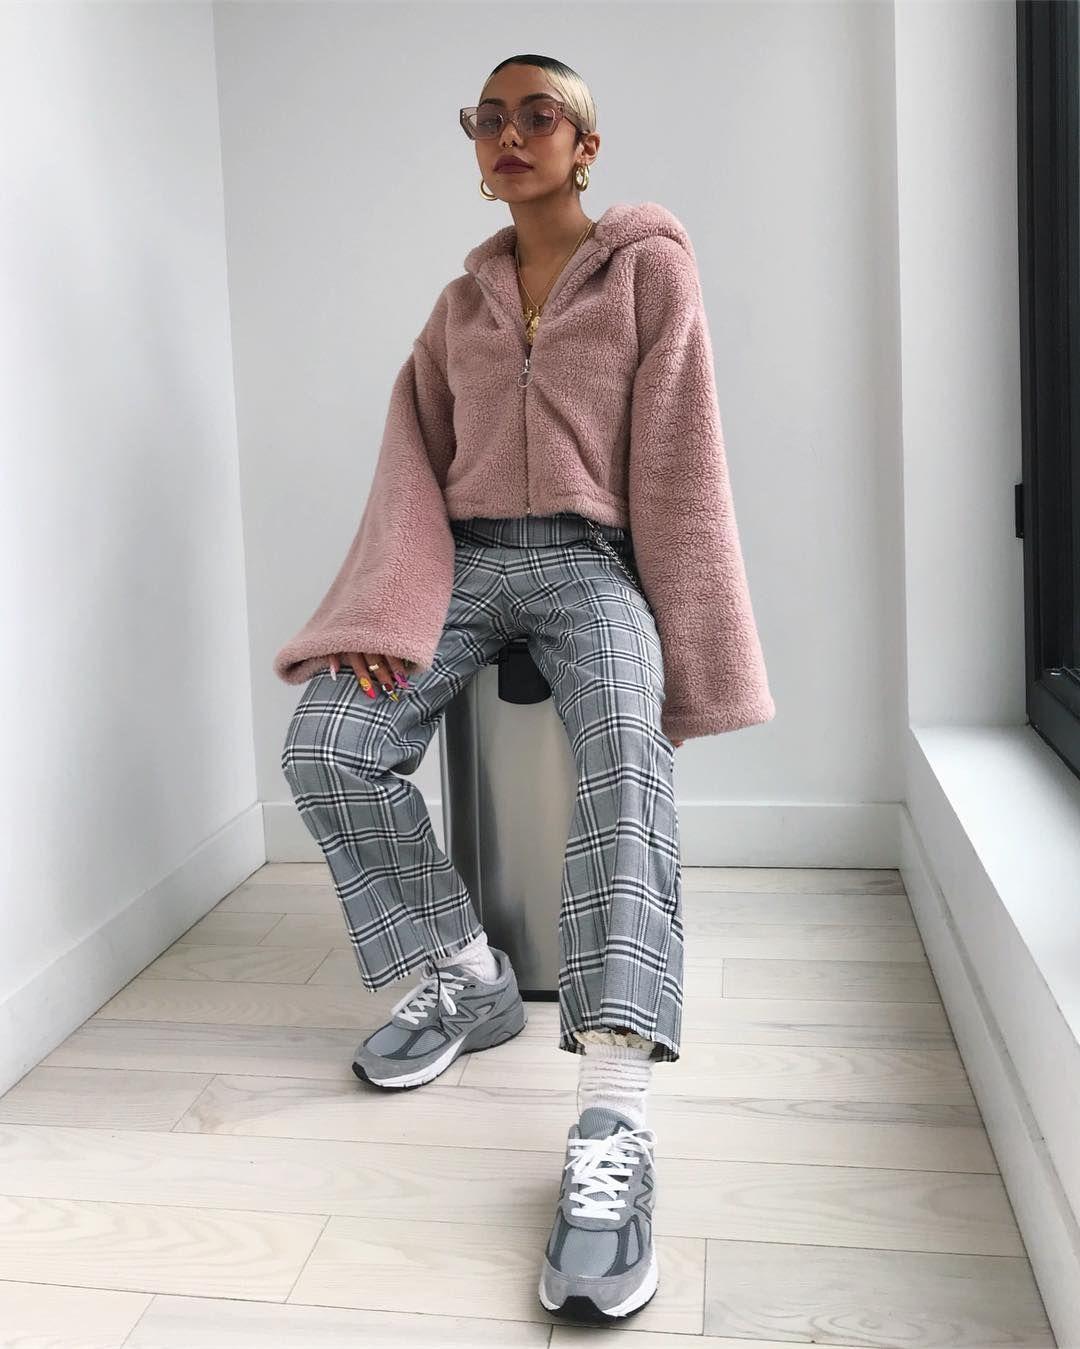 Groovy Baby Aesthetic Clothes Fashion Urban Fashion